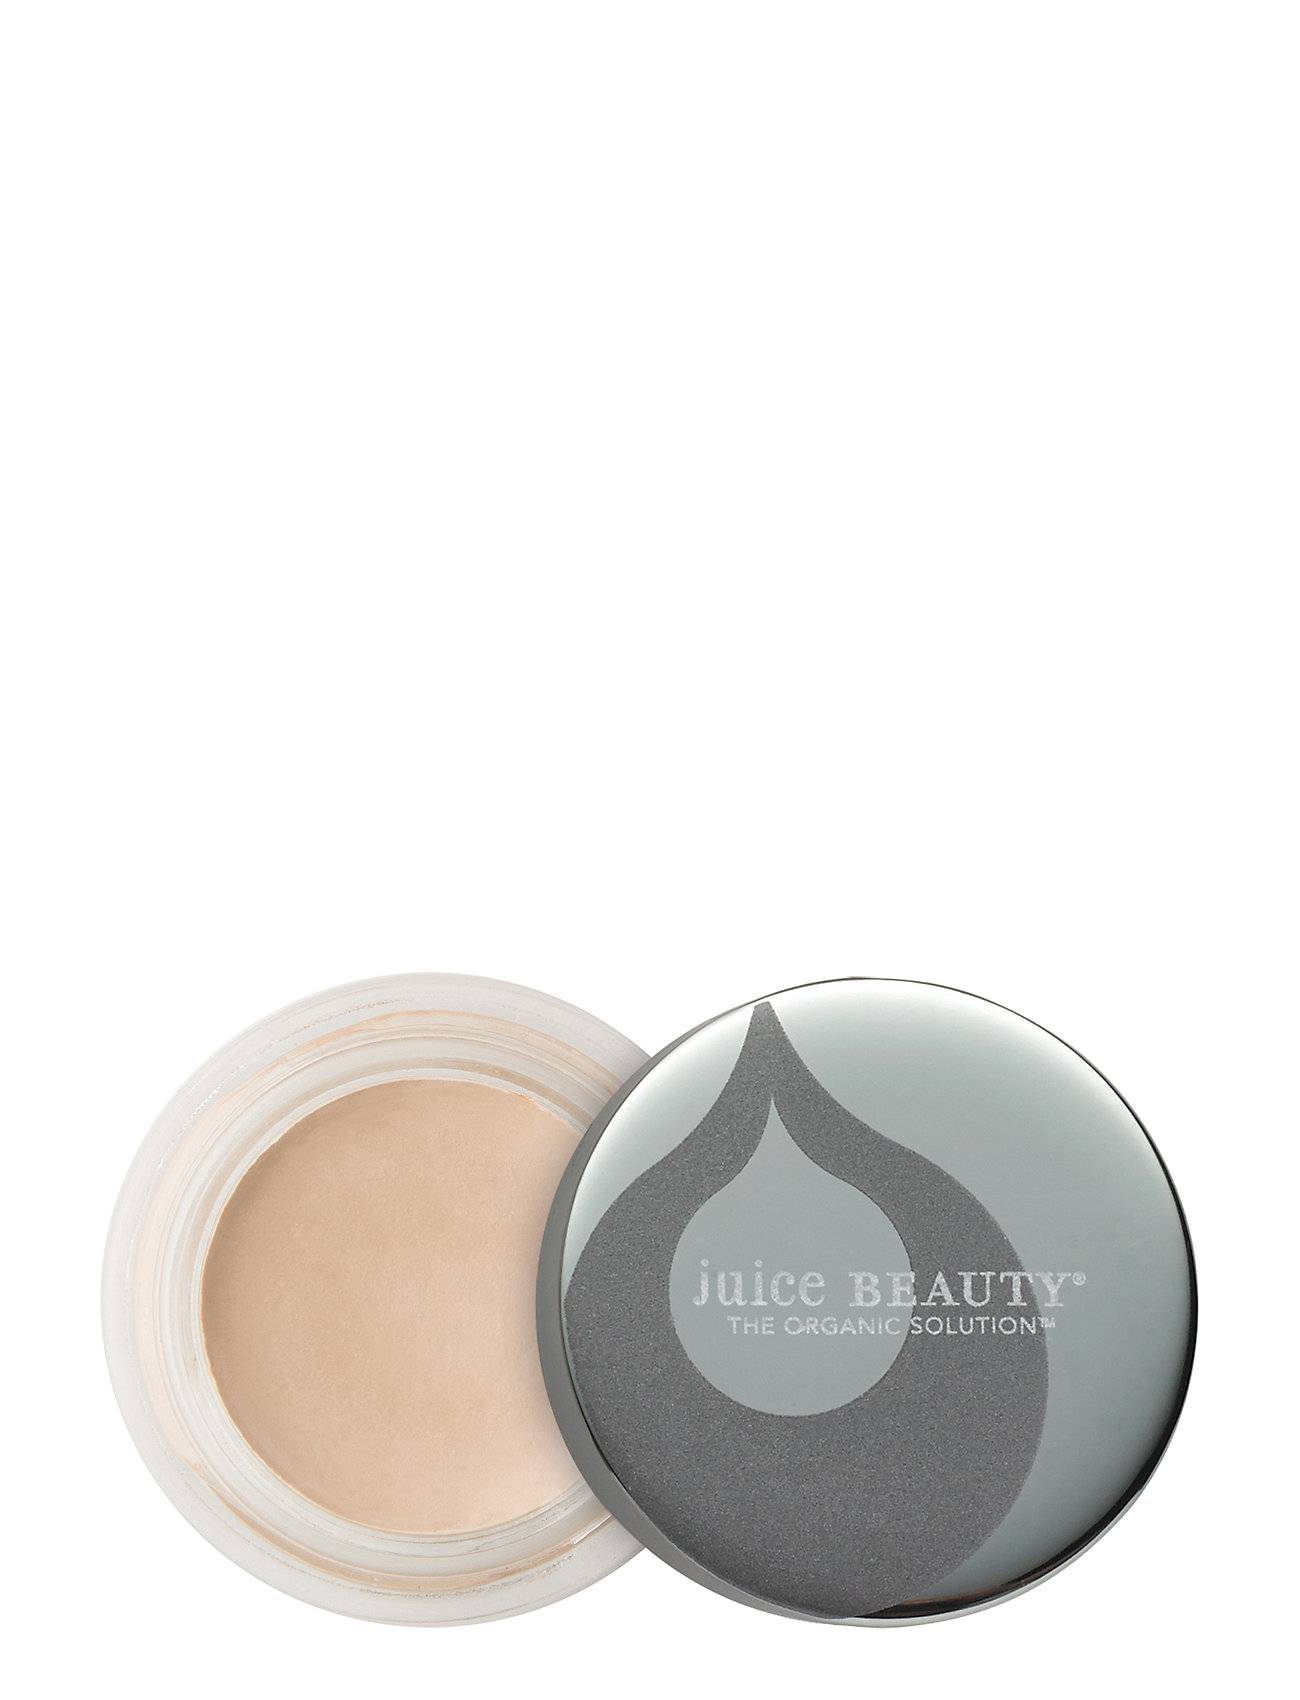 Juice Beauty Perfecting Concealer - 05 Buff